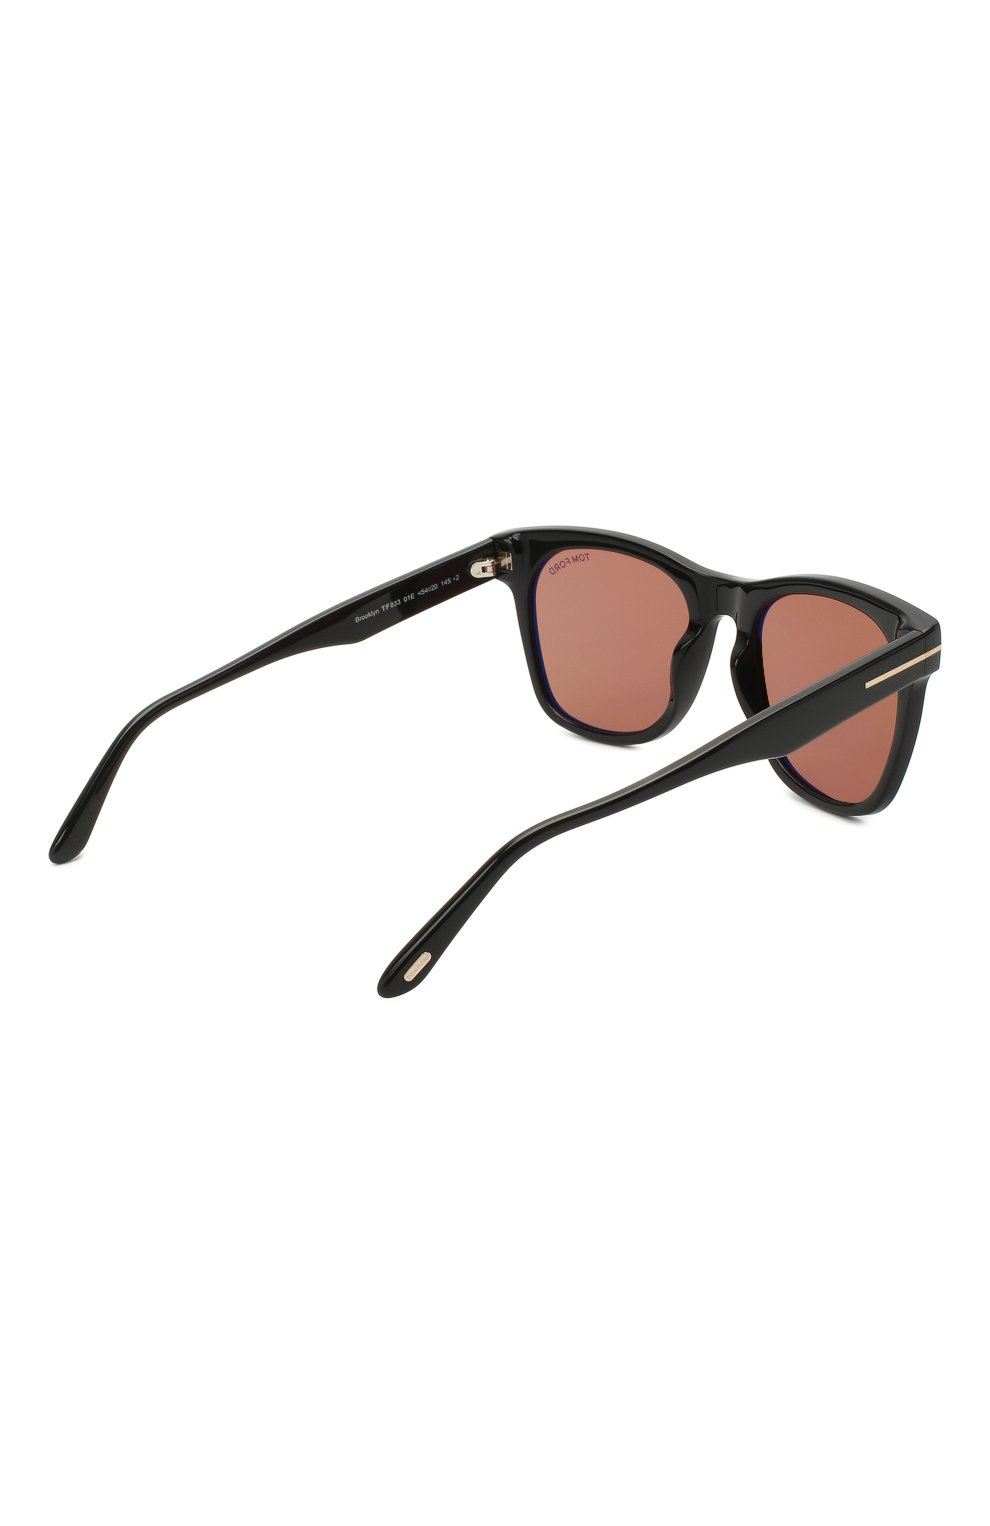 Мужские солнцезащитные очки TOM FORD коричневого цвета, арт. TF833 01E   Фото 4